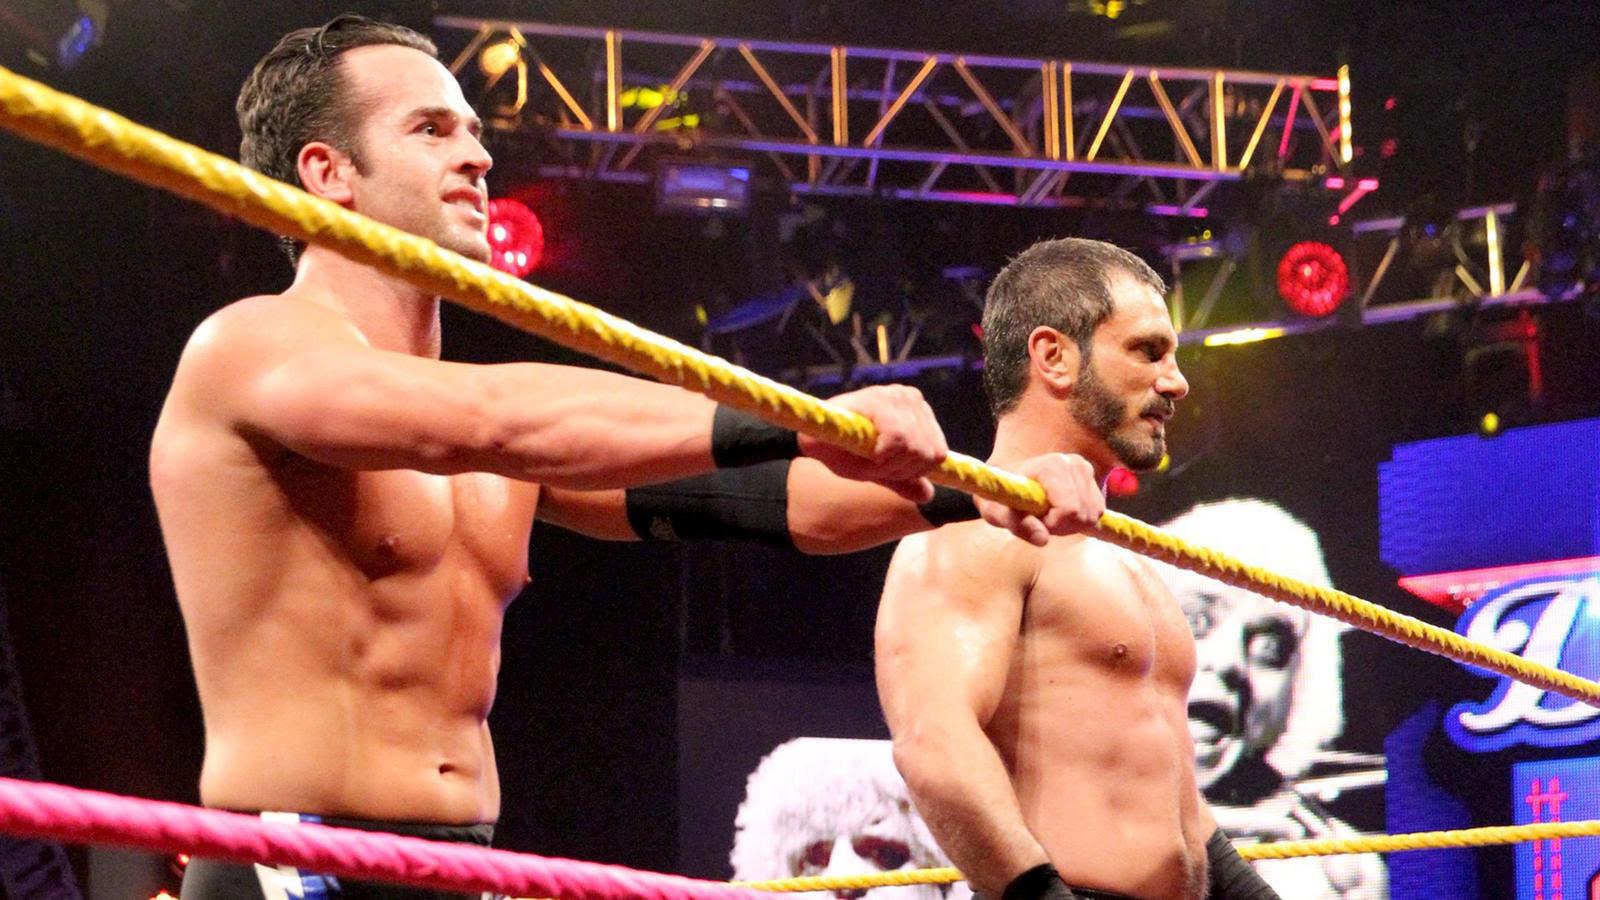 Cobertura: WWE NXT Wrestling (19/10/2016)